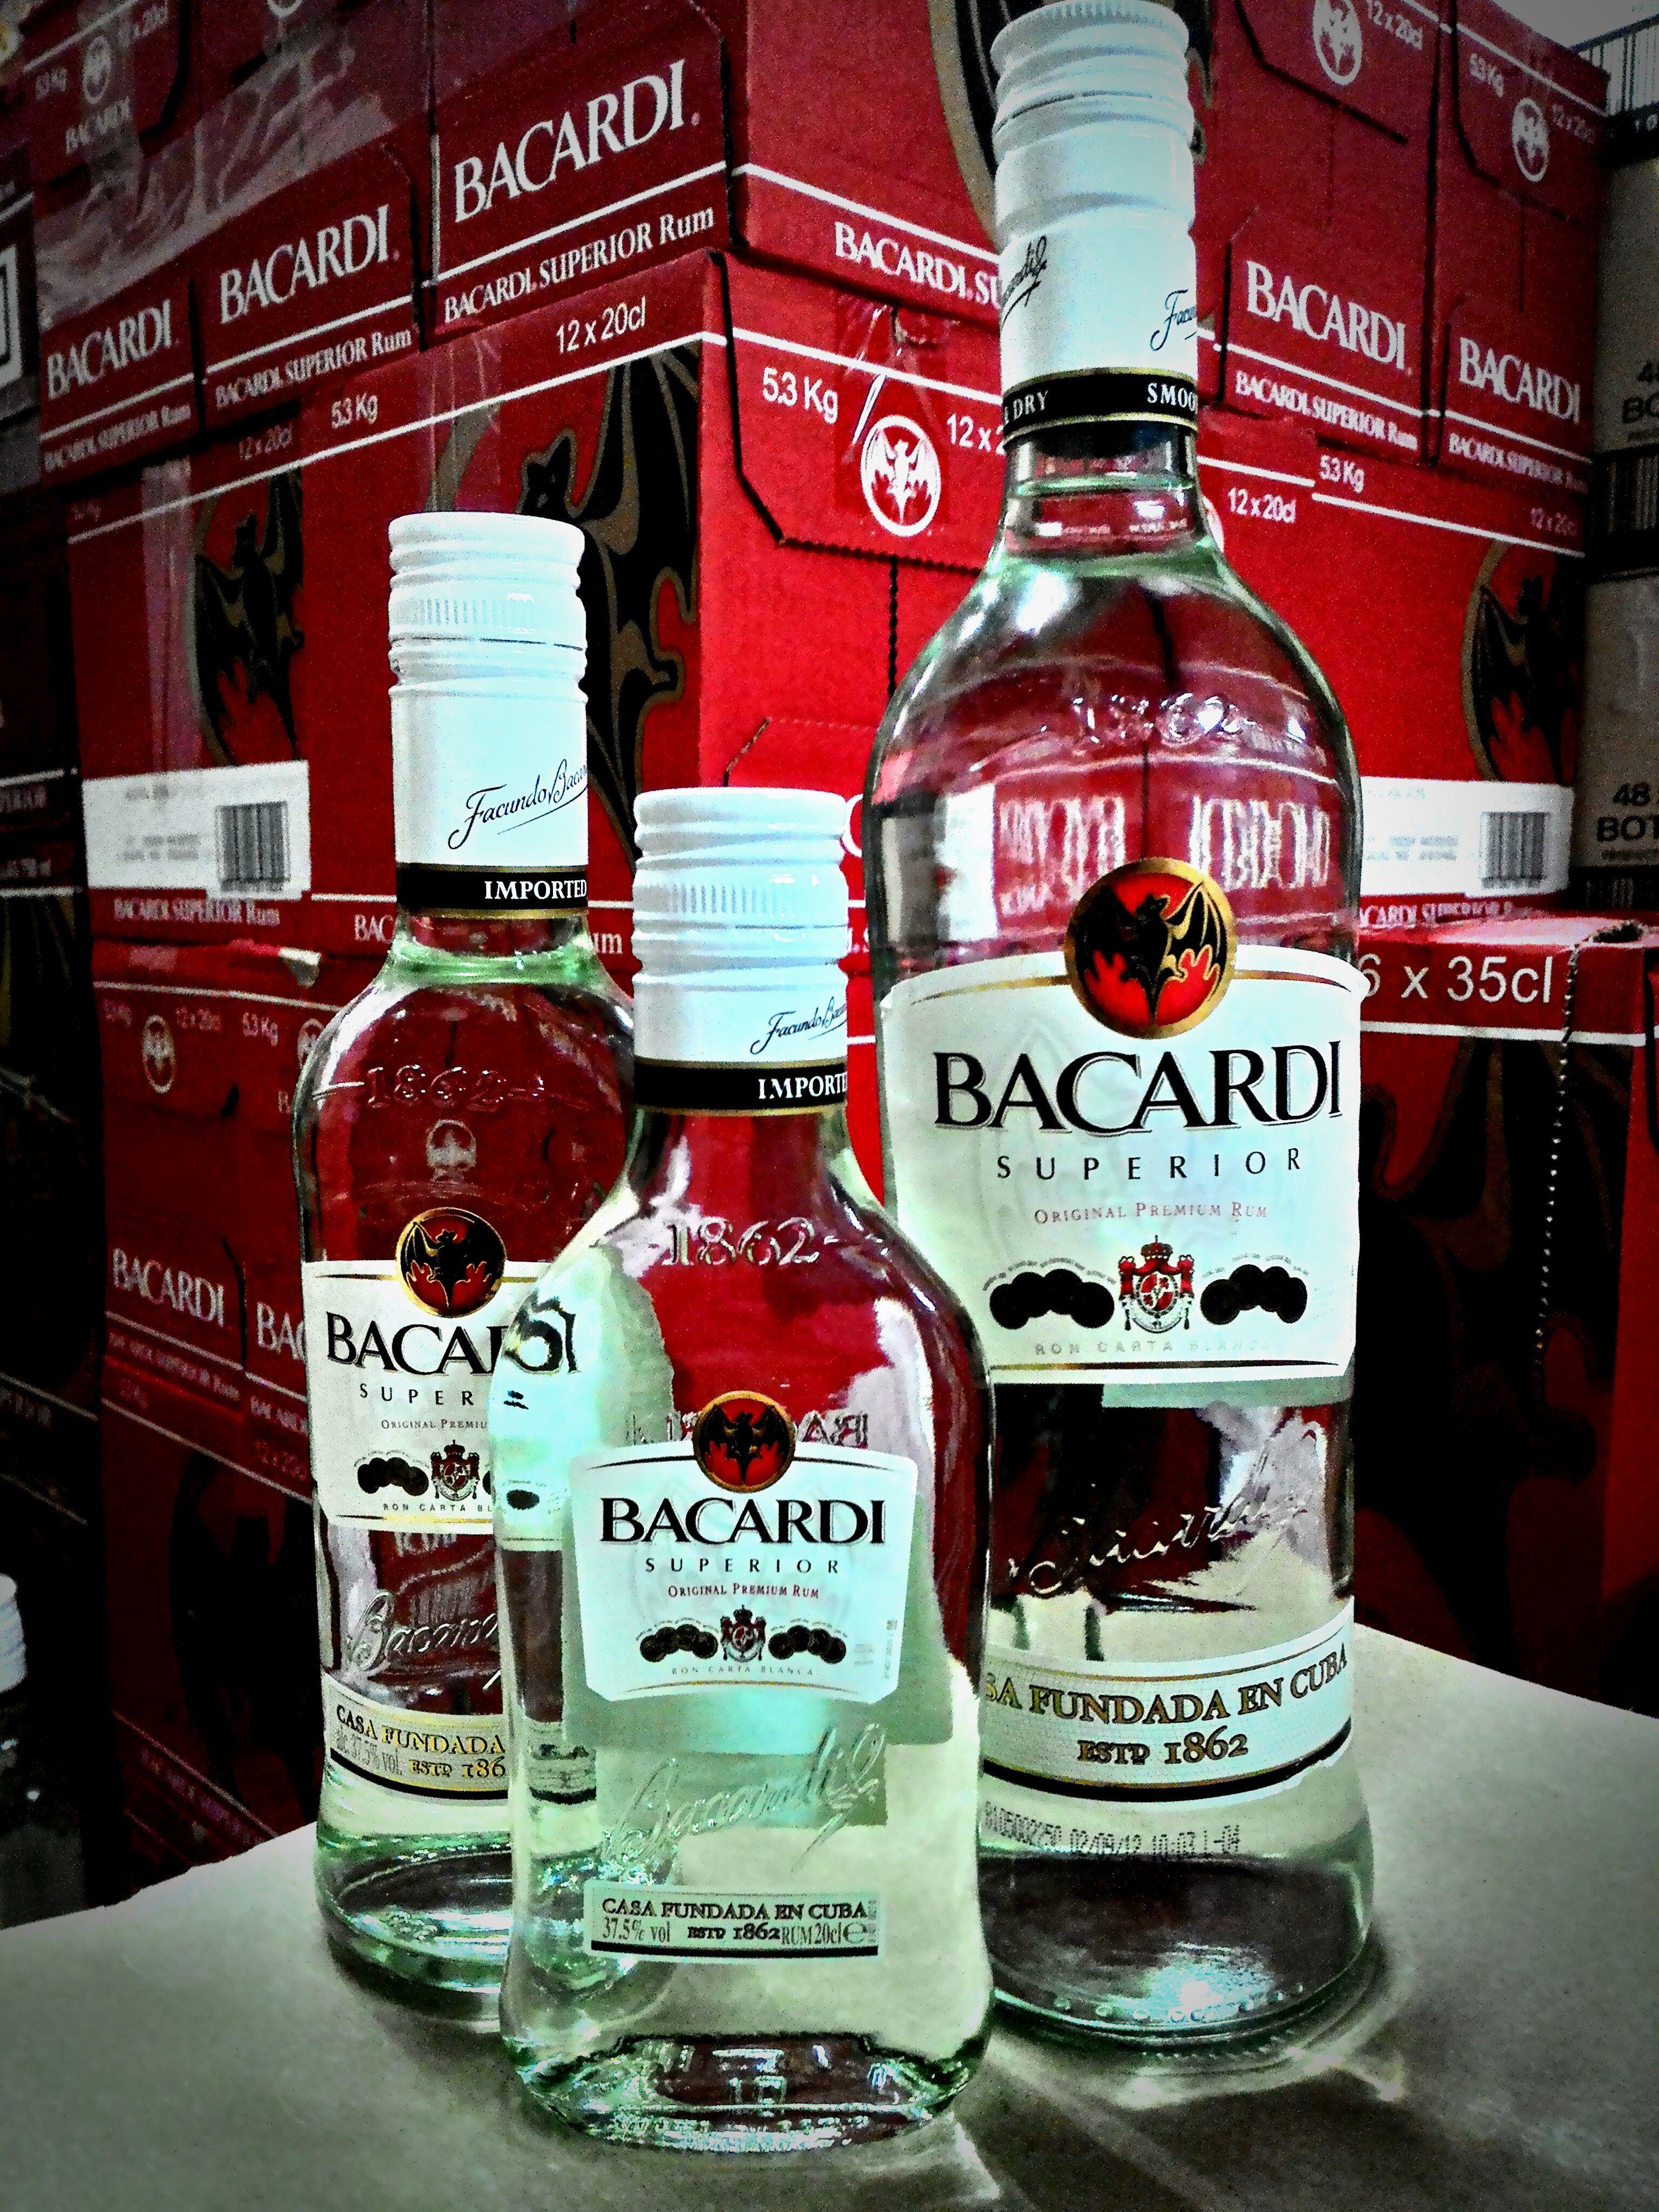 Barcadi Superior Rum Www Newcastl Com Sg Rum Drinks Drinks Bacardi